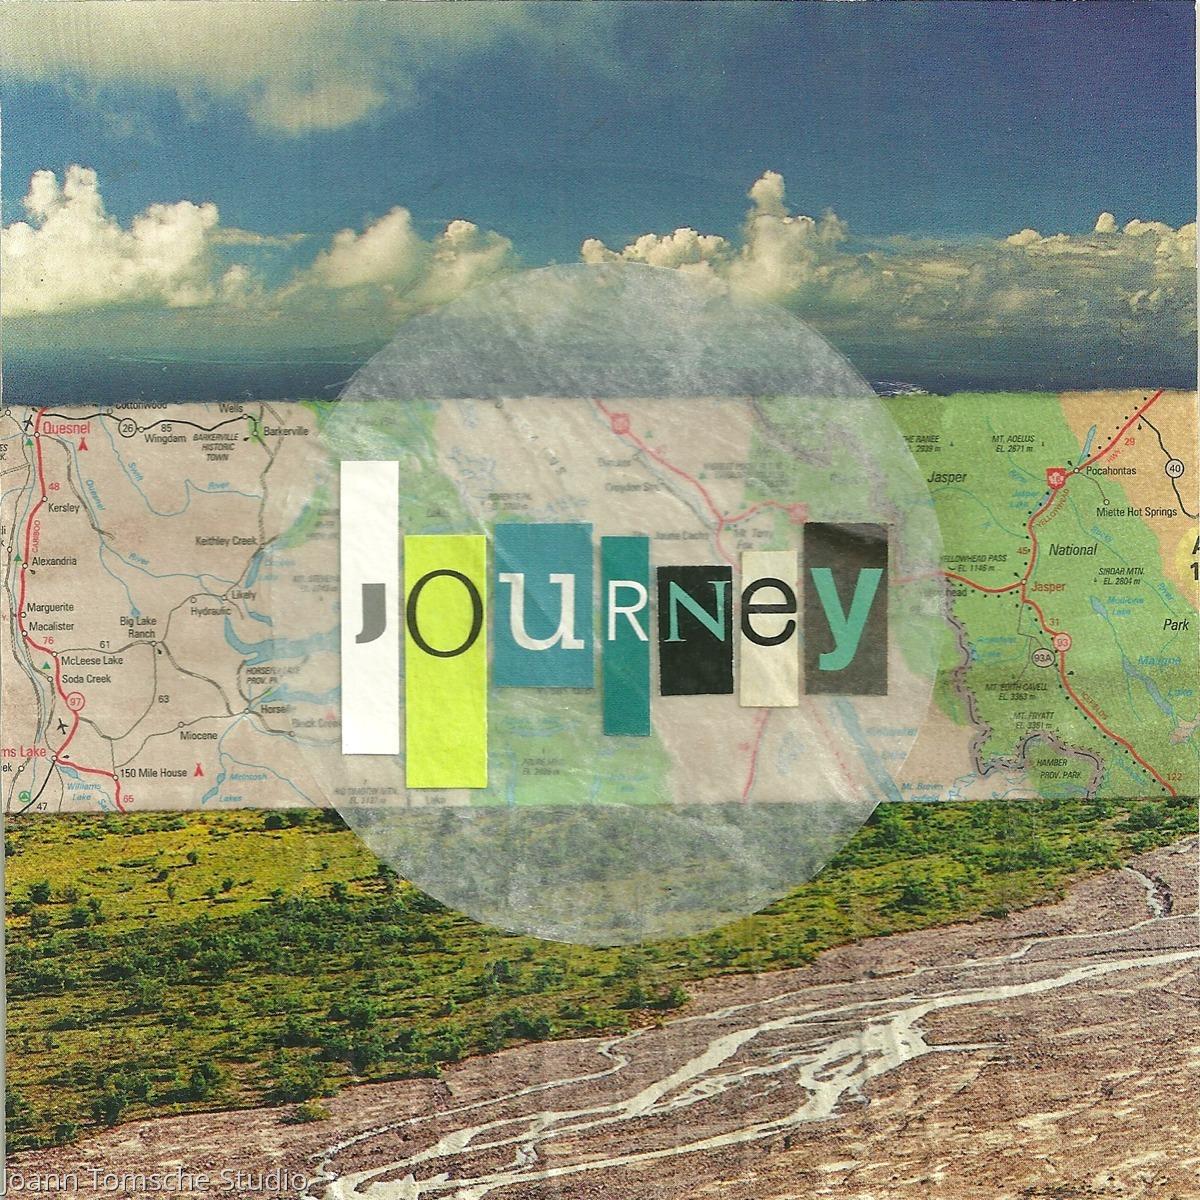 Journey art tile (large view)